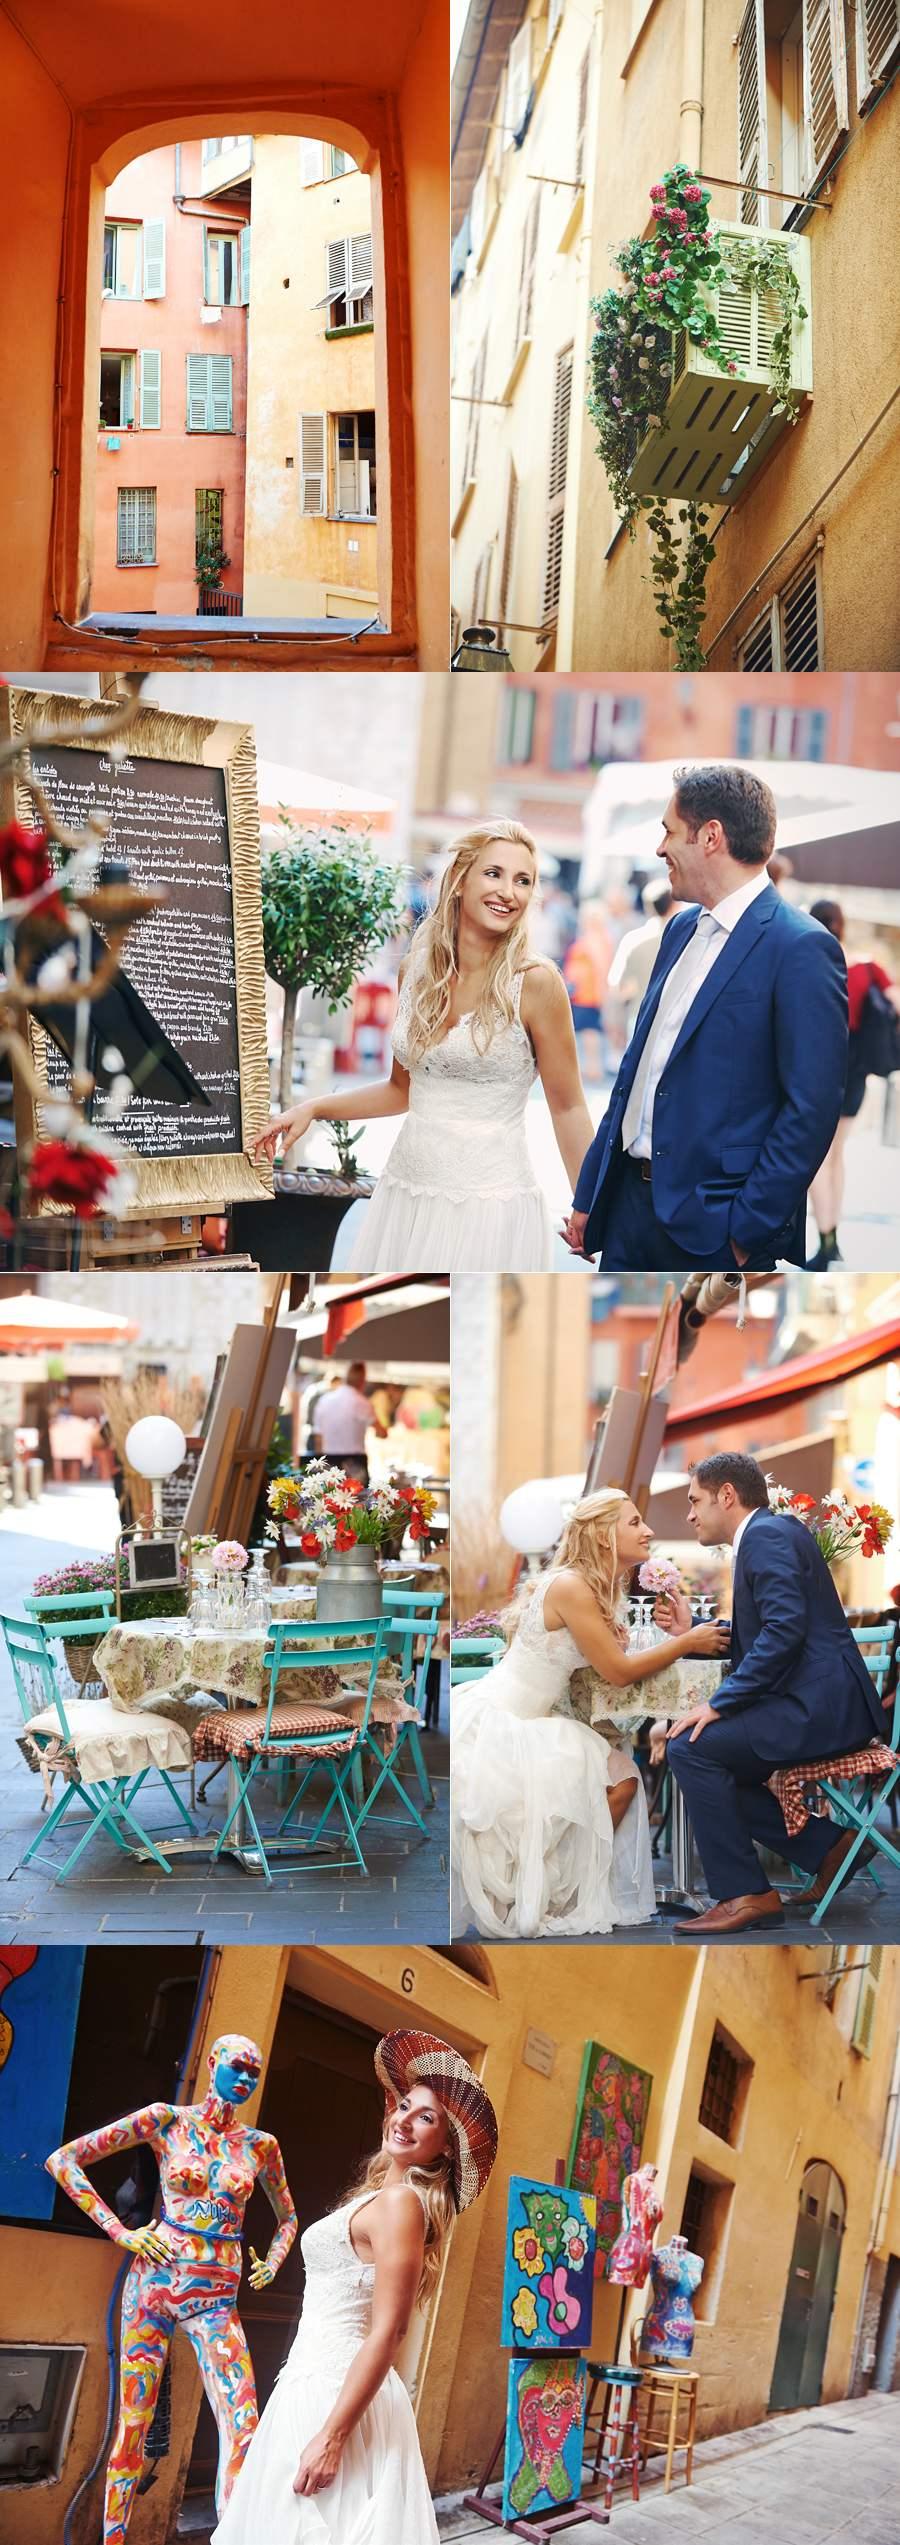 Stavros Efi wedding photos06